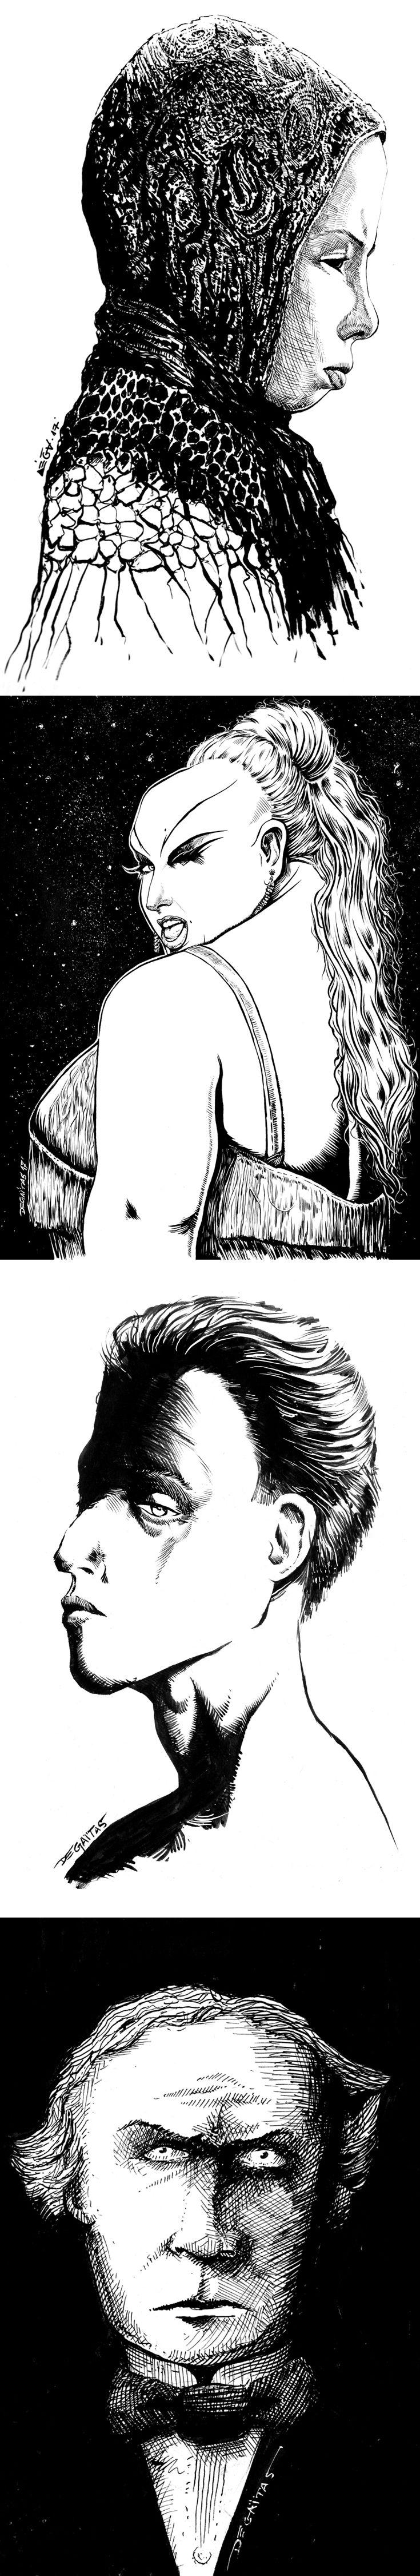 Drawings by Kostas Degaitas on Behance at https://www.behance.net/gallery/47971323/Drawings-2017 #art #drawing #girl #movie #tarkovsky #divine #houdini #sad #portrait